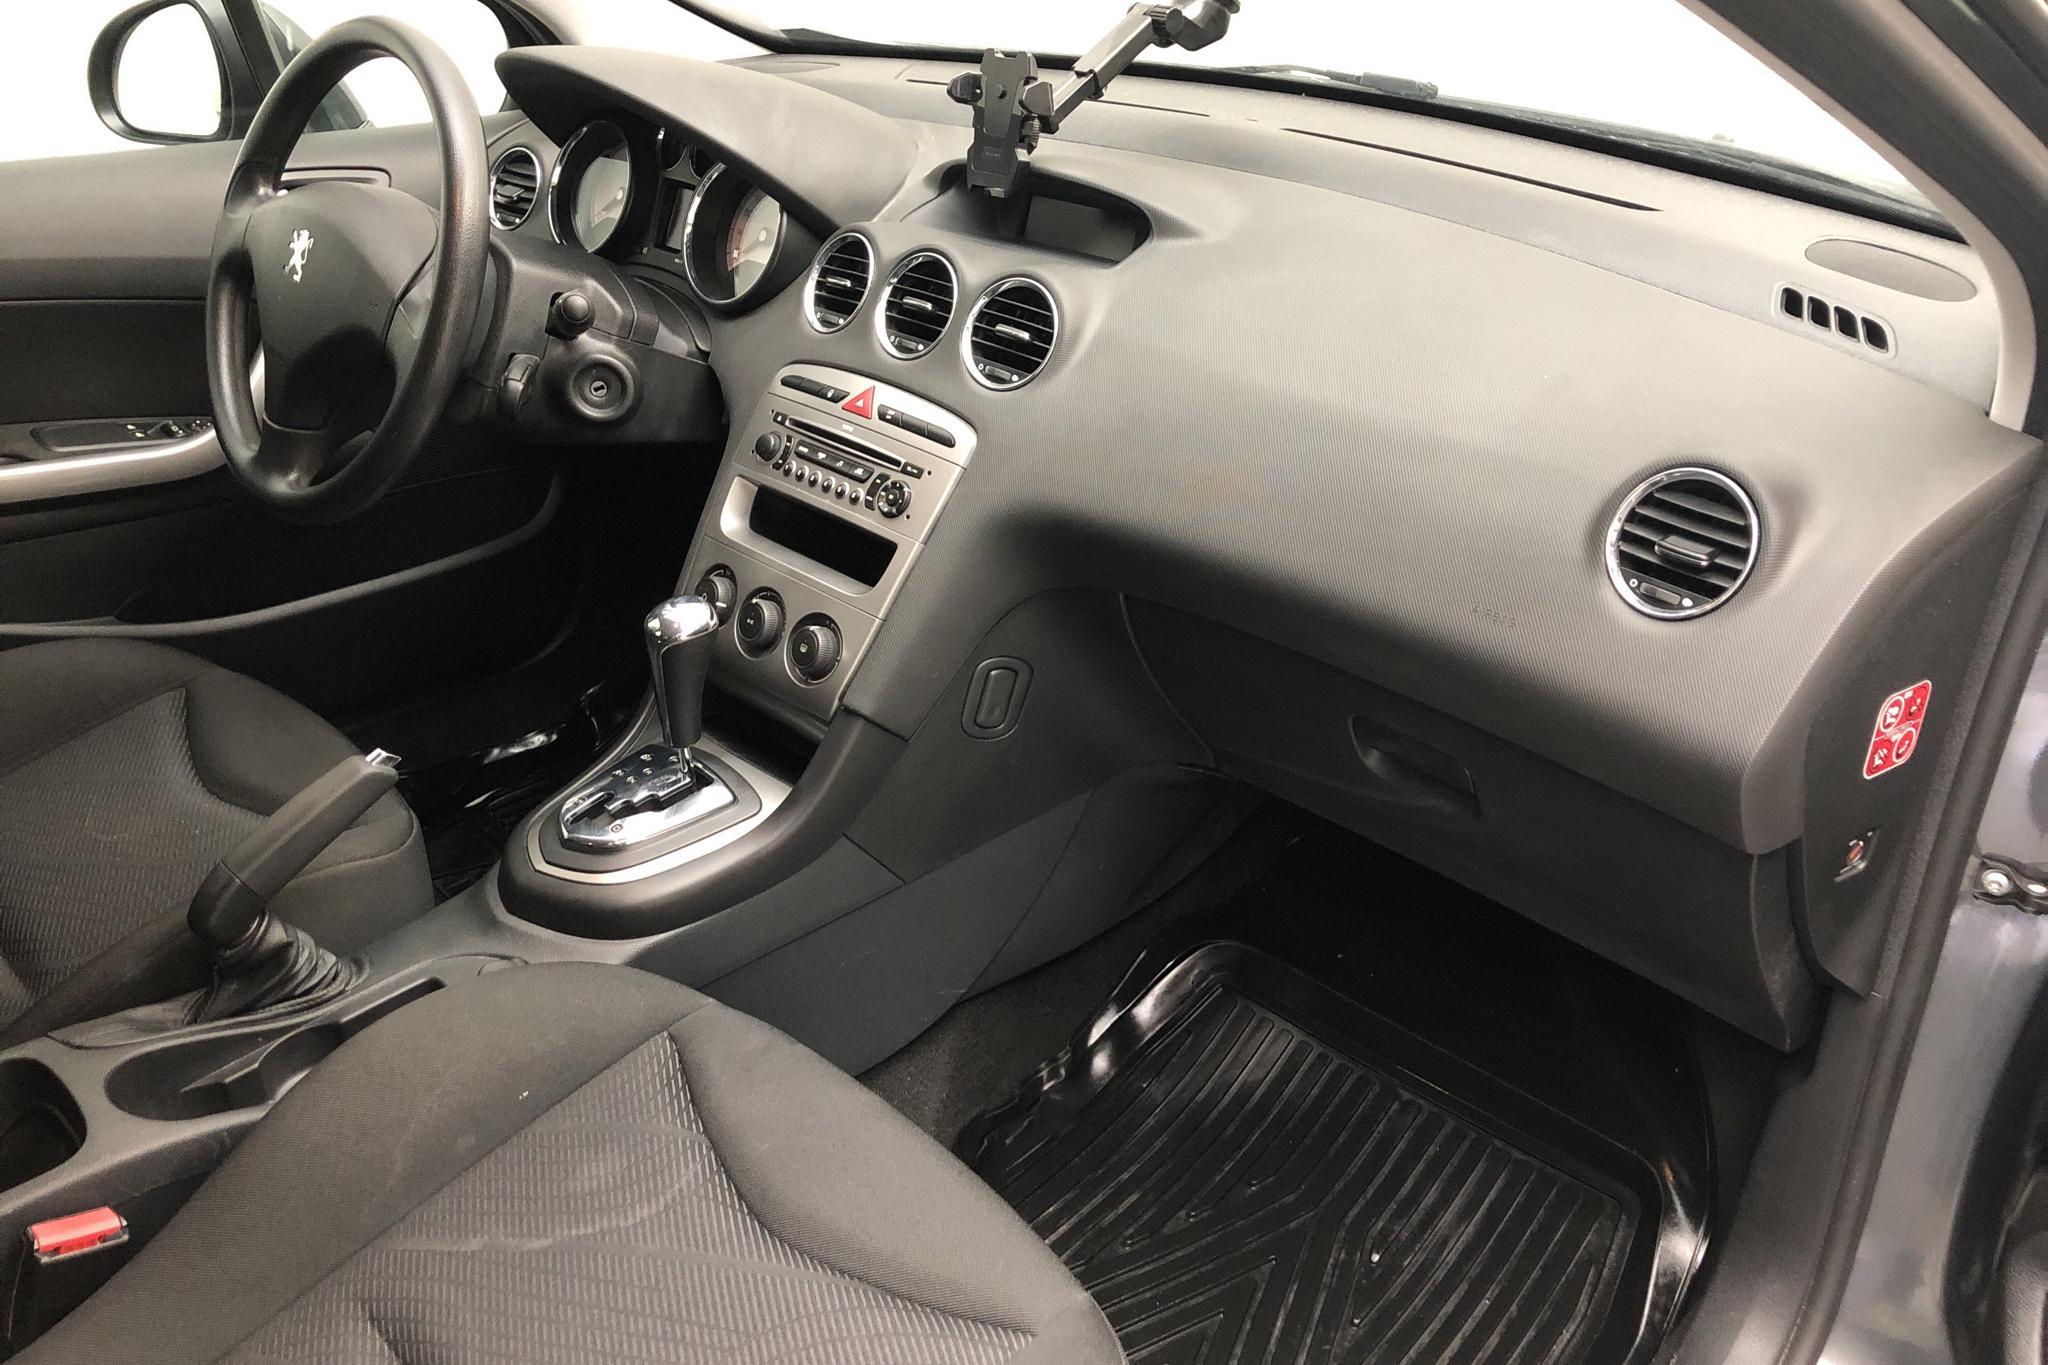 Peugeot 308 SW 1.6 VTi (120hk) - 9 615 mil - Automat - Dark Grey - 2009